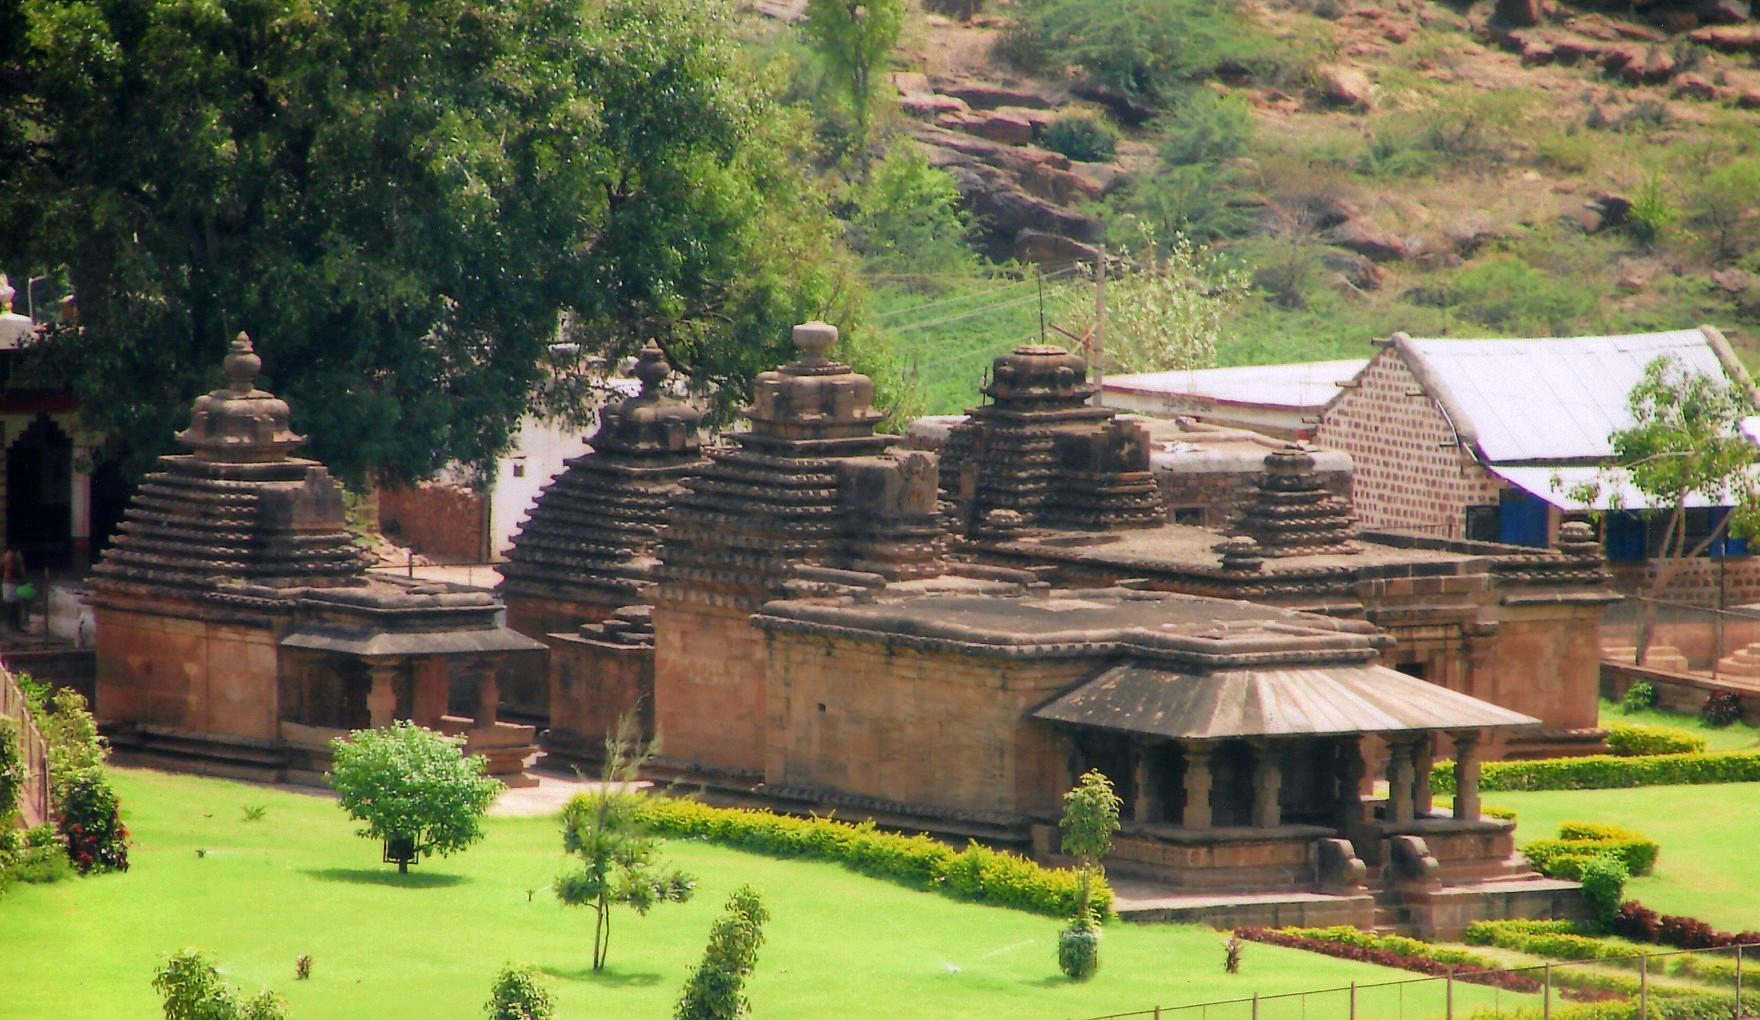 Bhoo varaha temple in bangalore dating 6